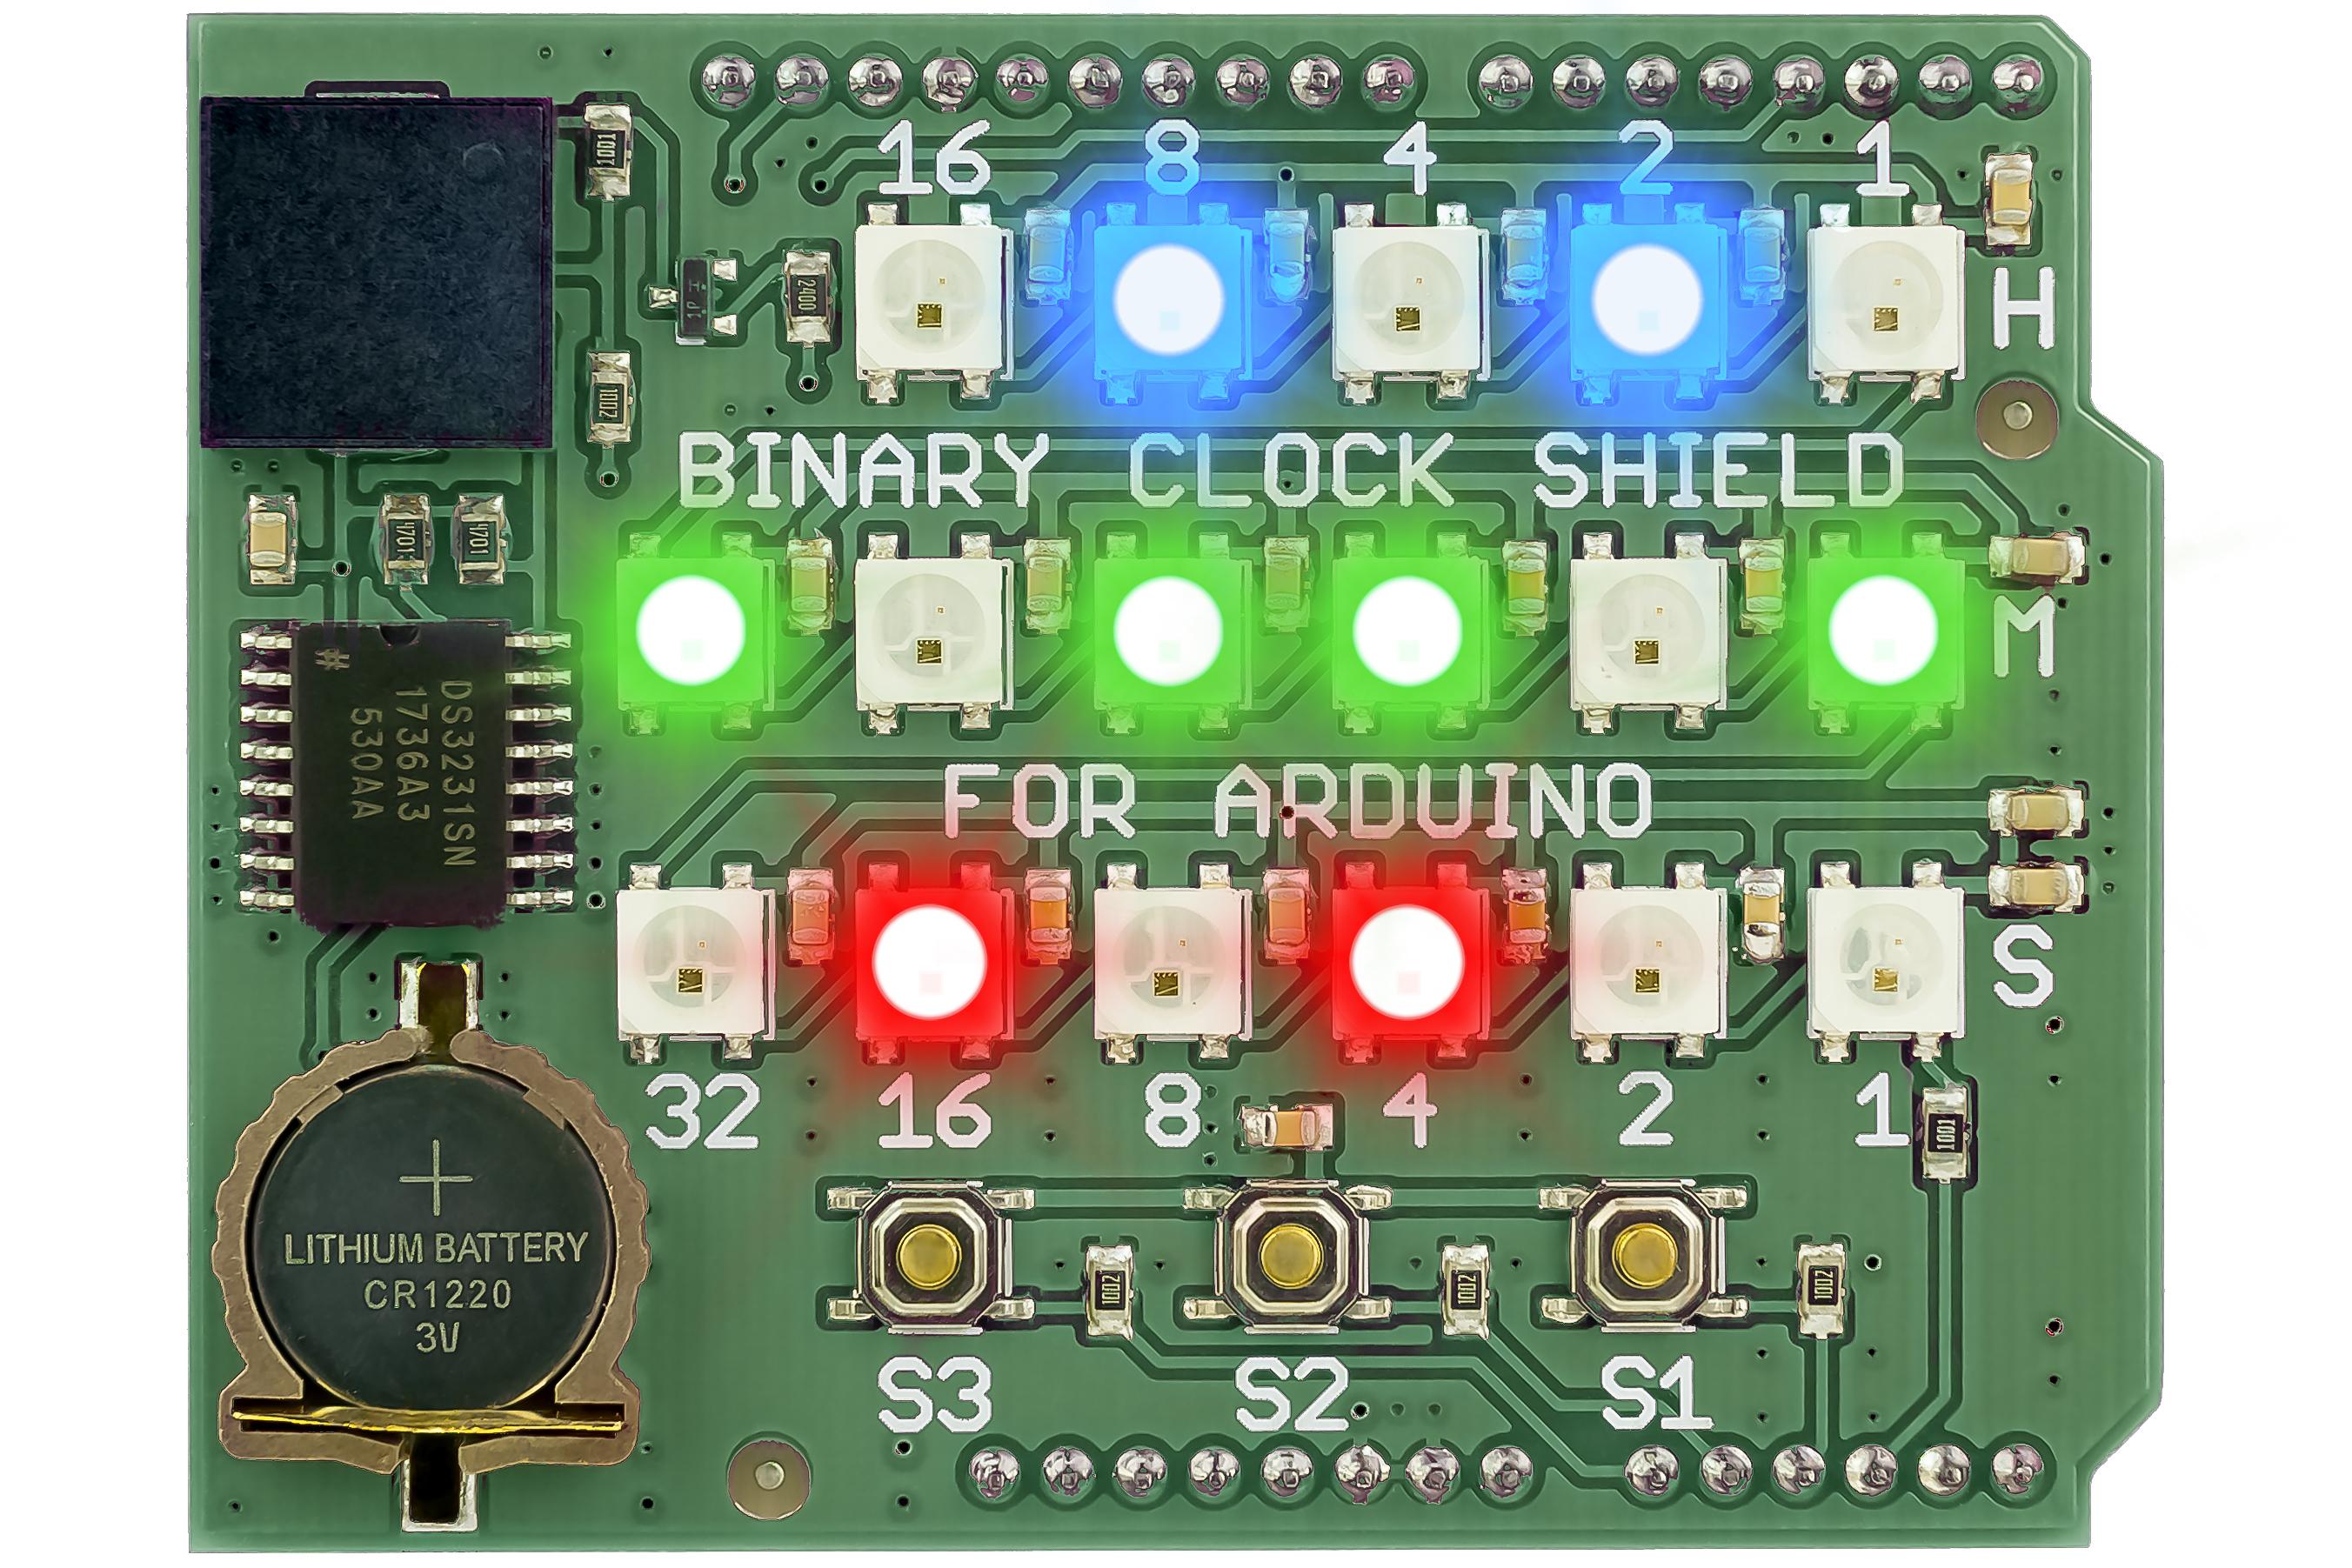 Binary Clock Shield for Arduino